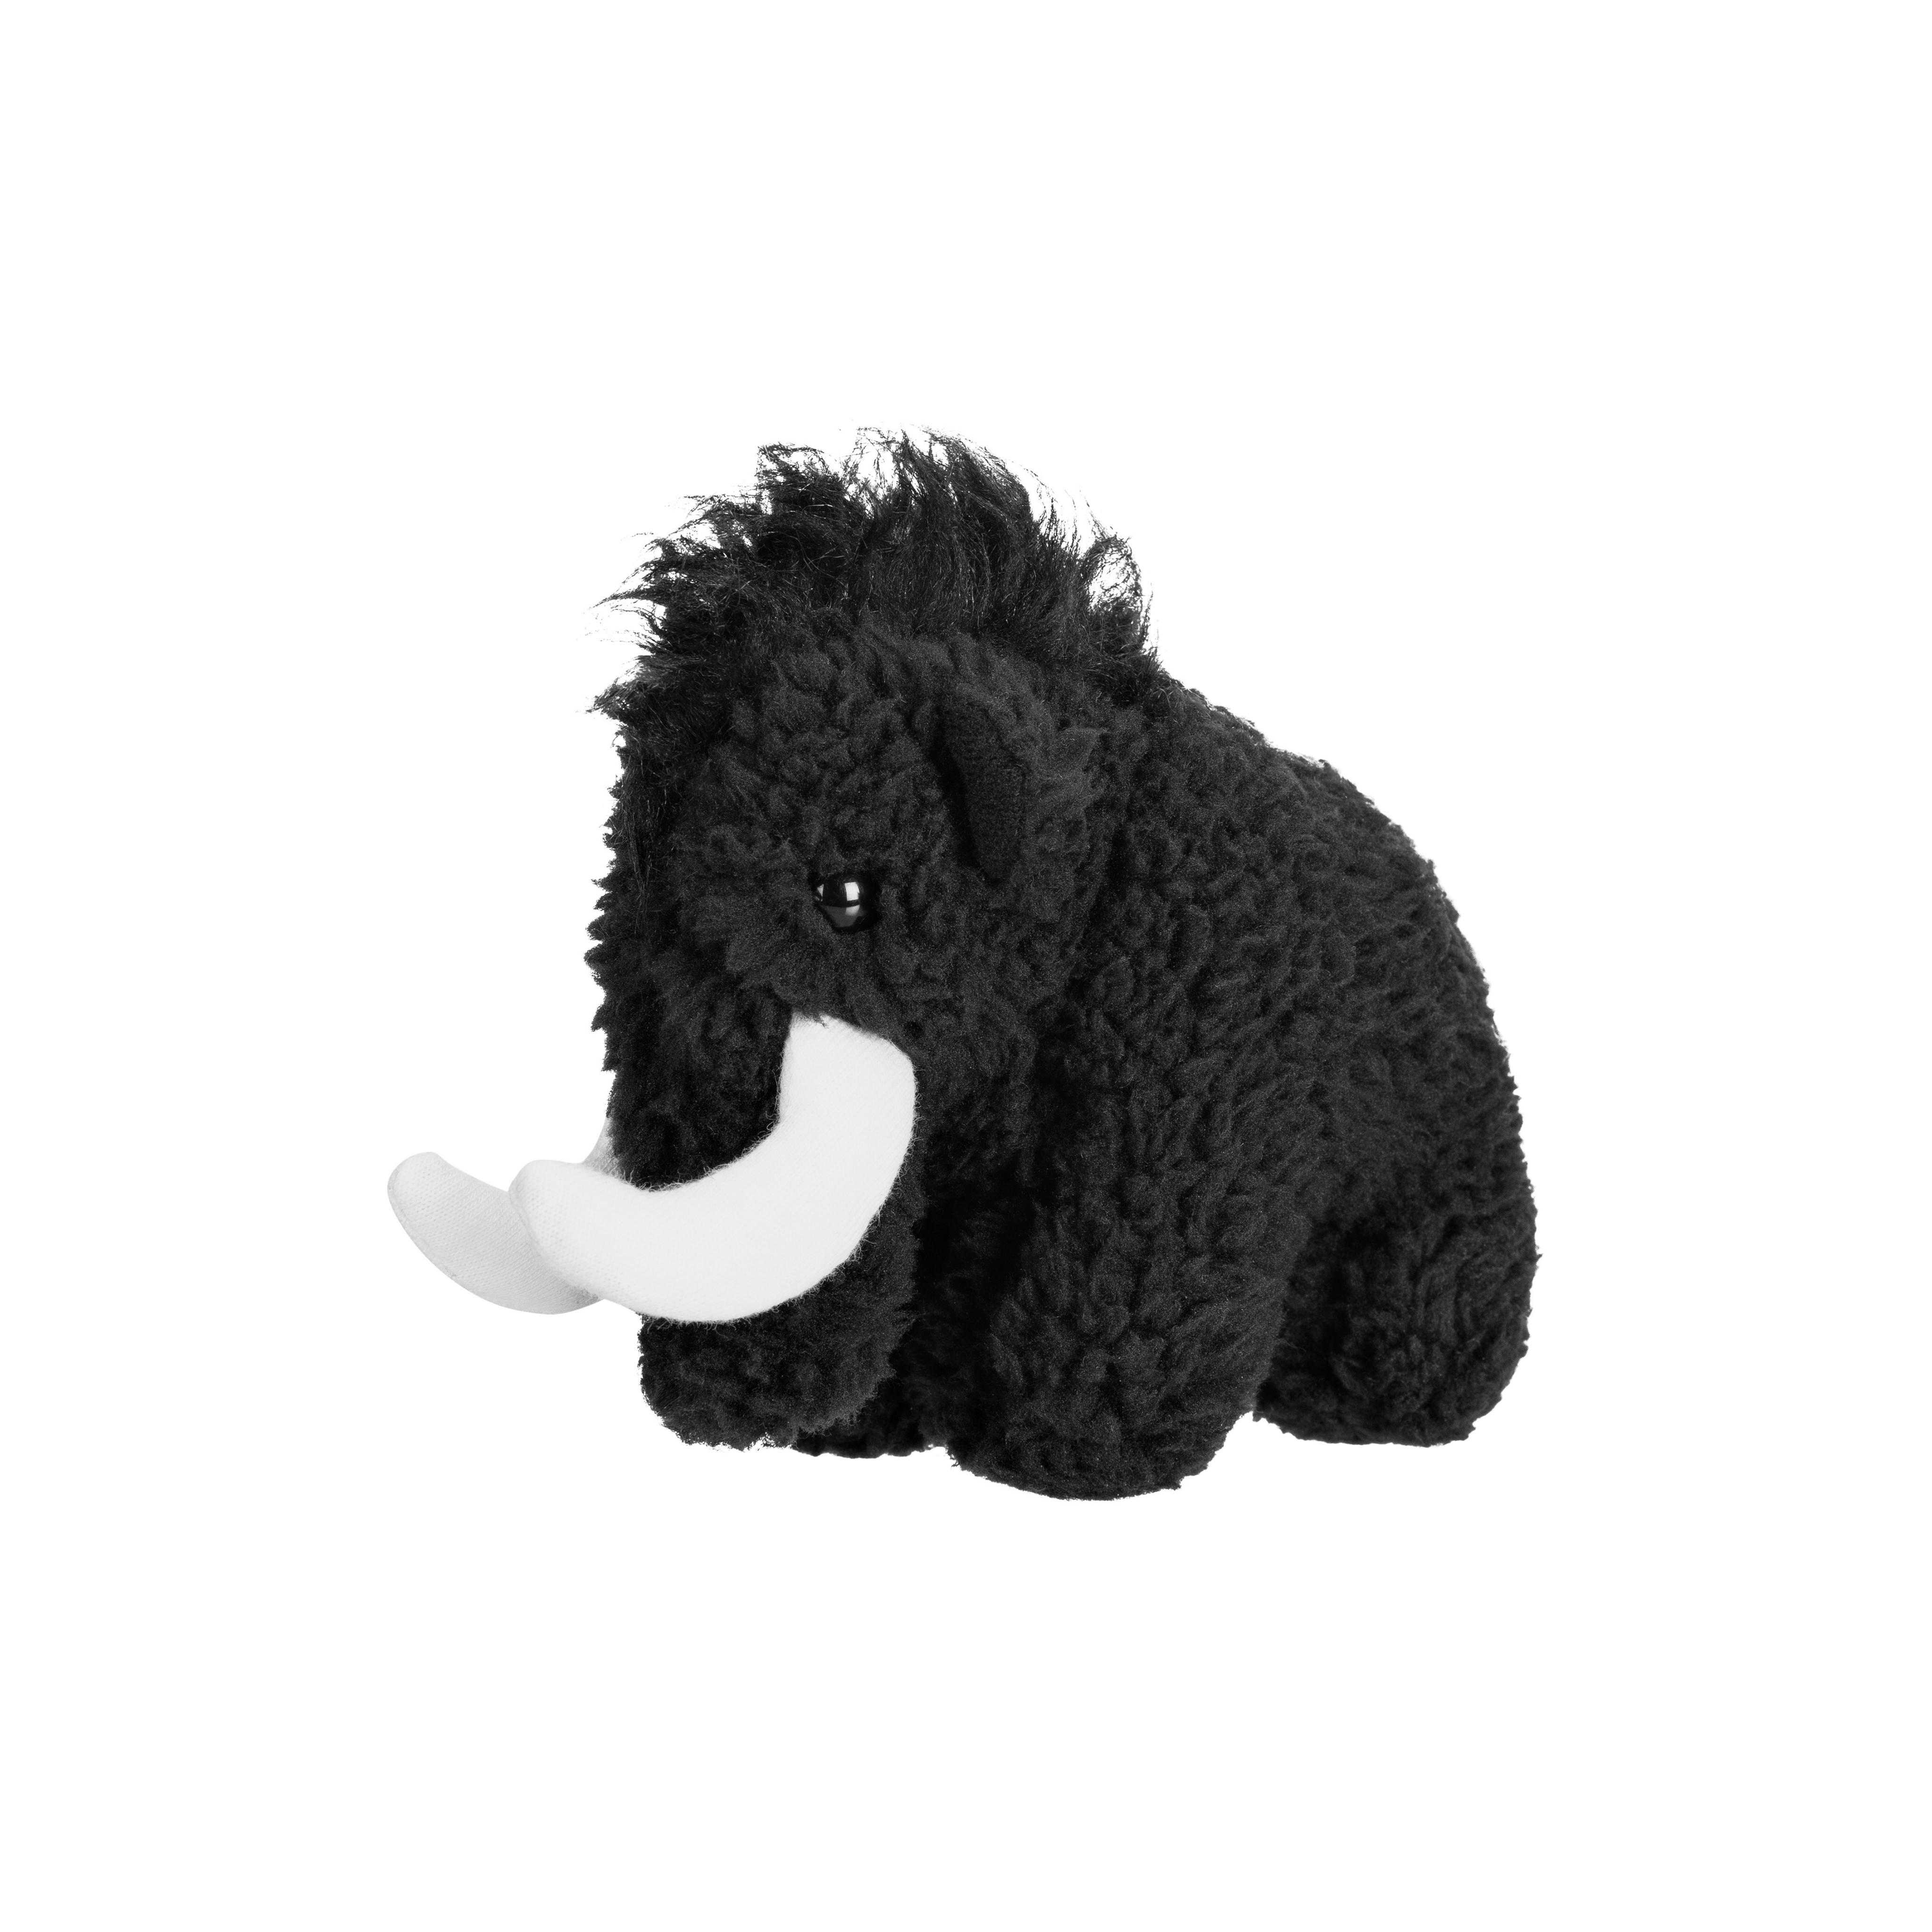 Mammut Toy - black, S thumbnail